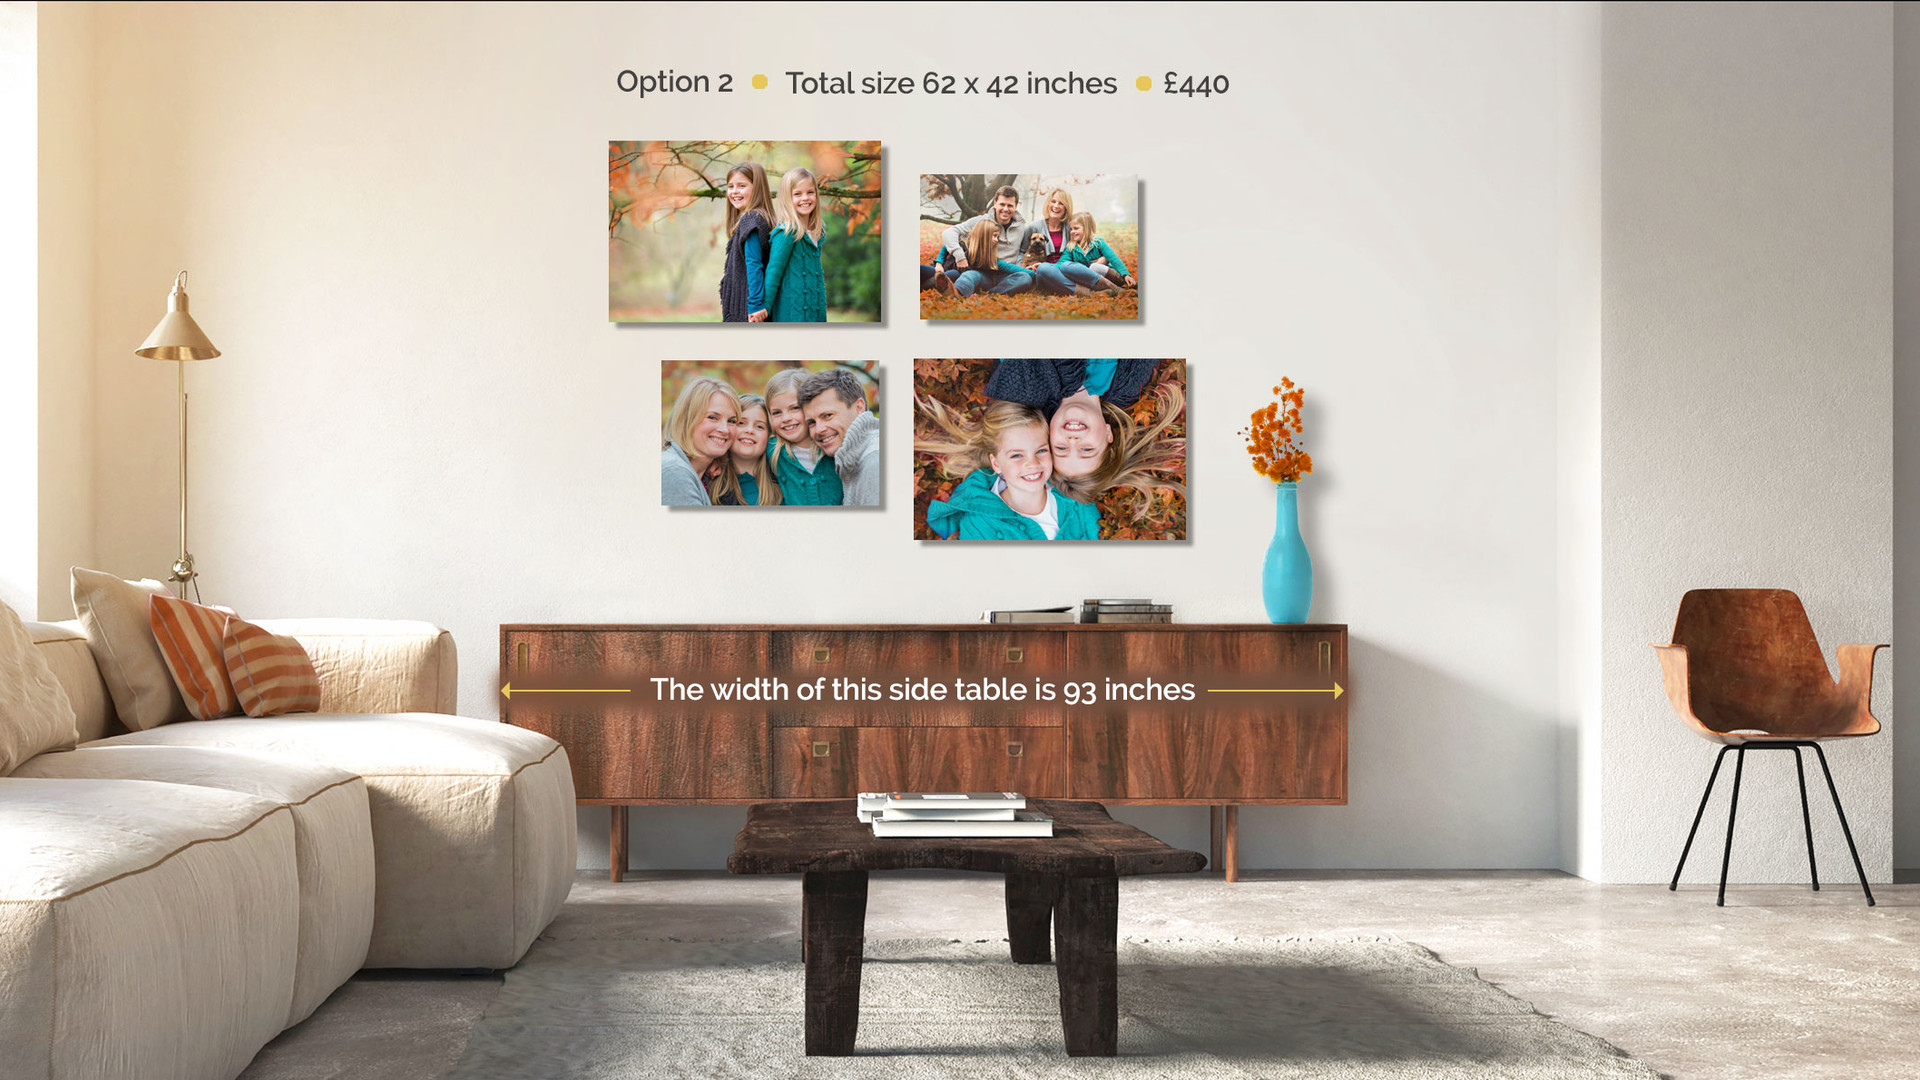 canvas-gallery-option-2.jpg